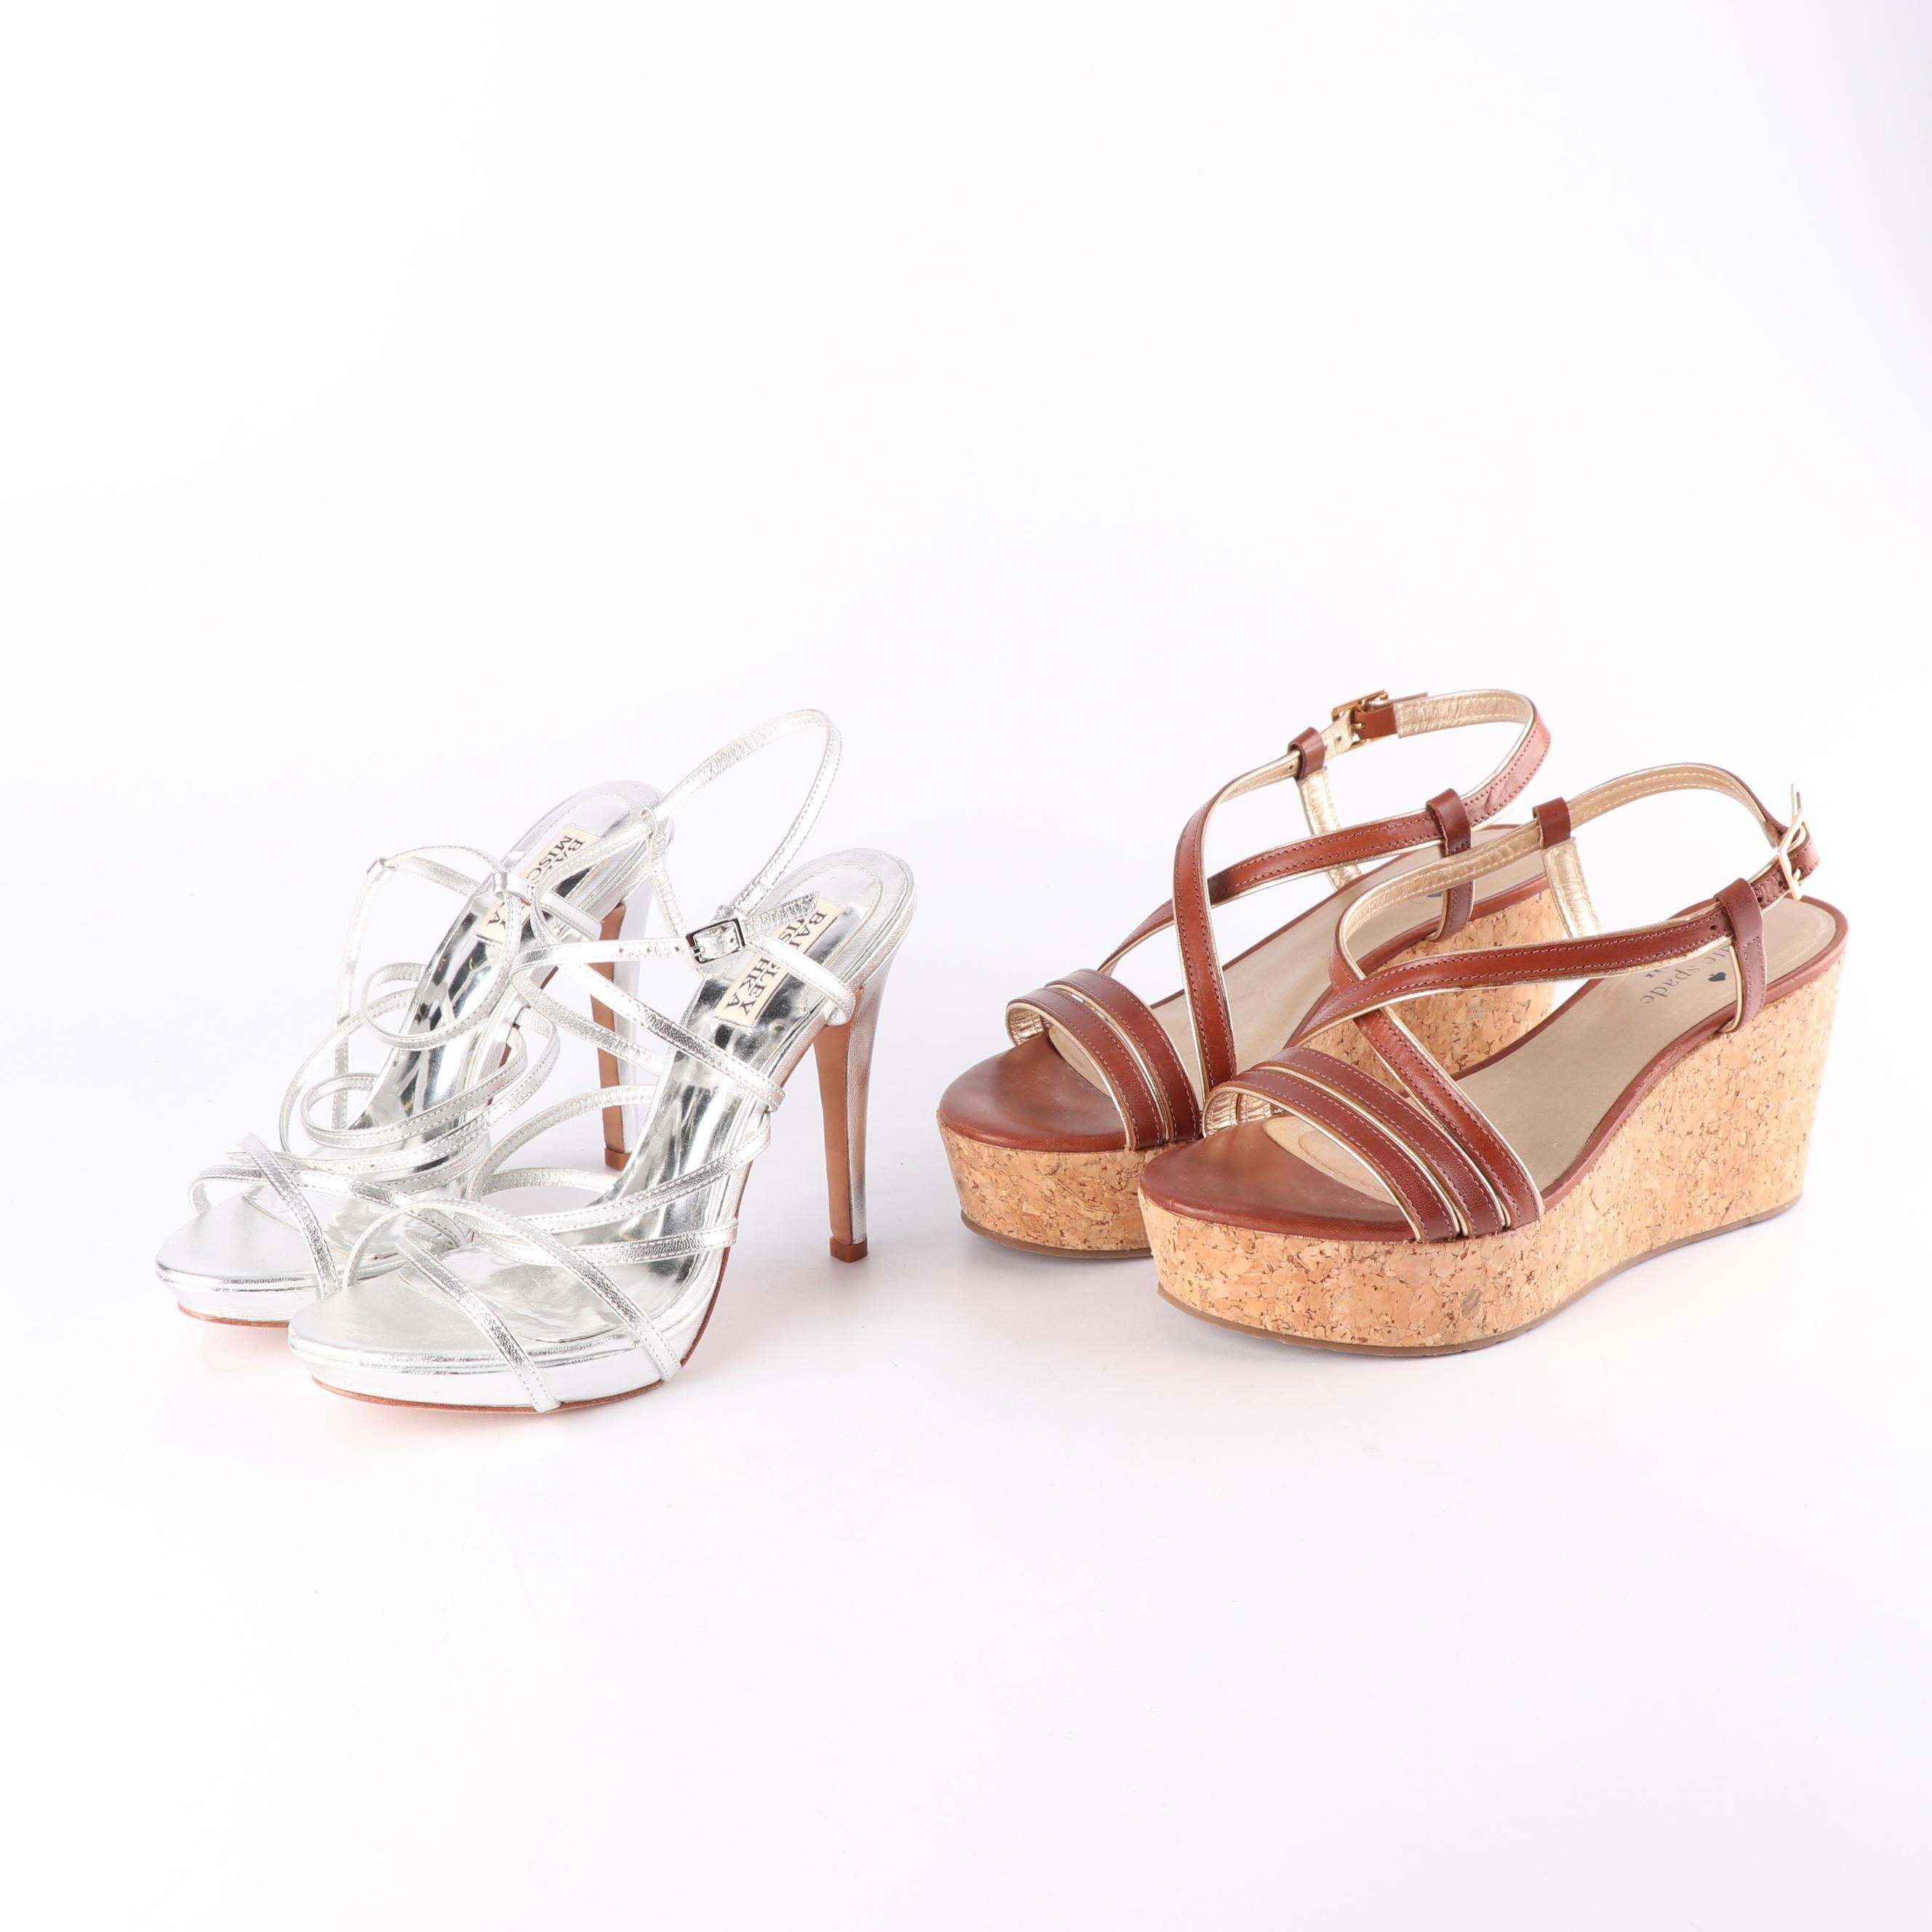 Badgley Mischka Platform Sandals and Kate Spade New York Cork Wedge Sandals